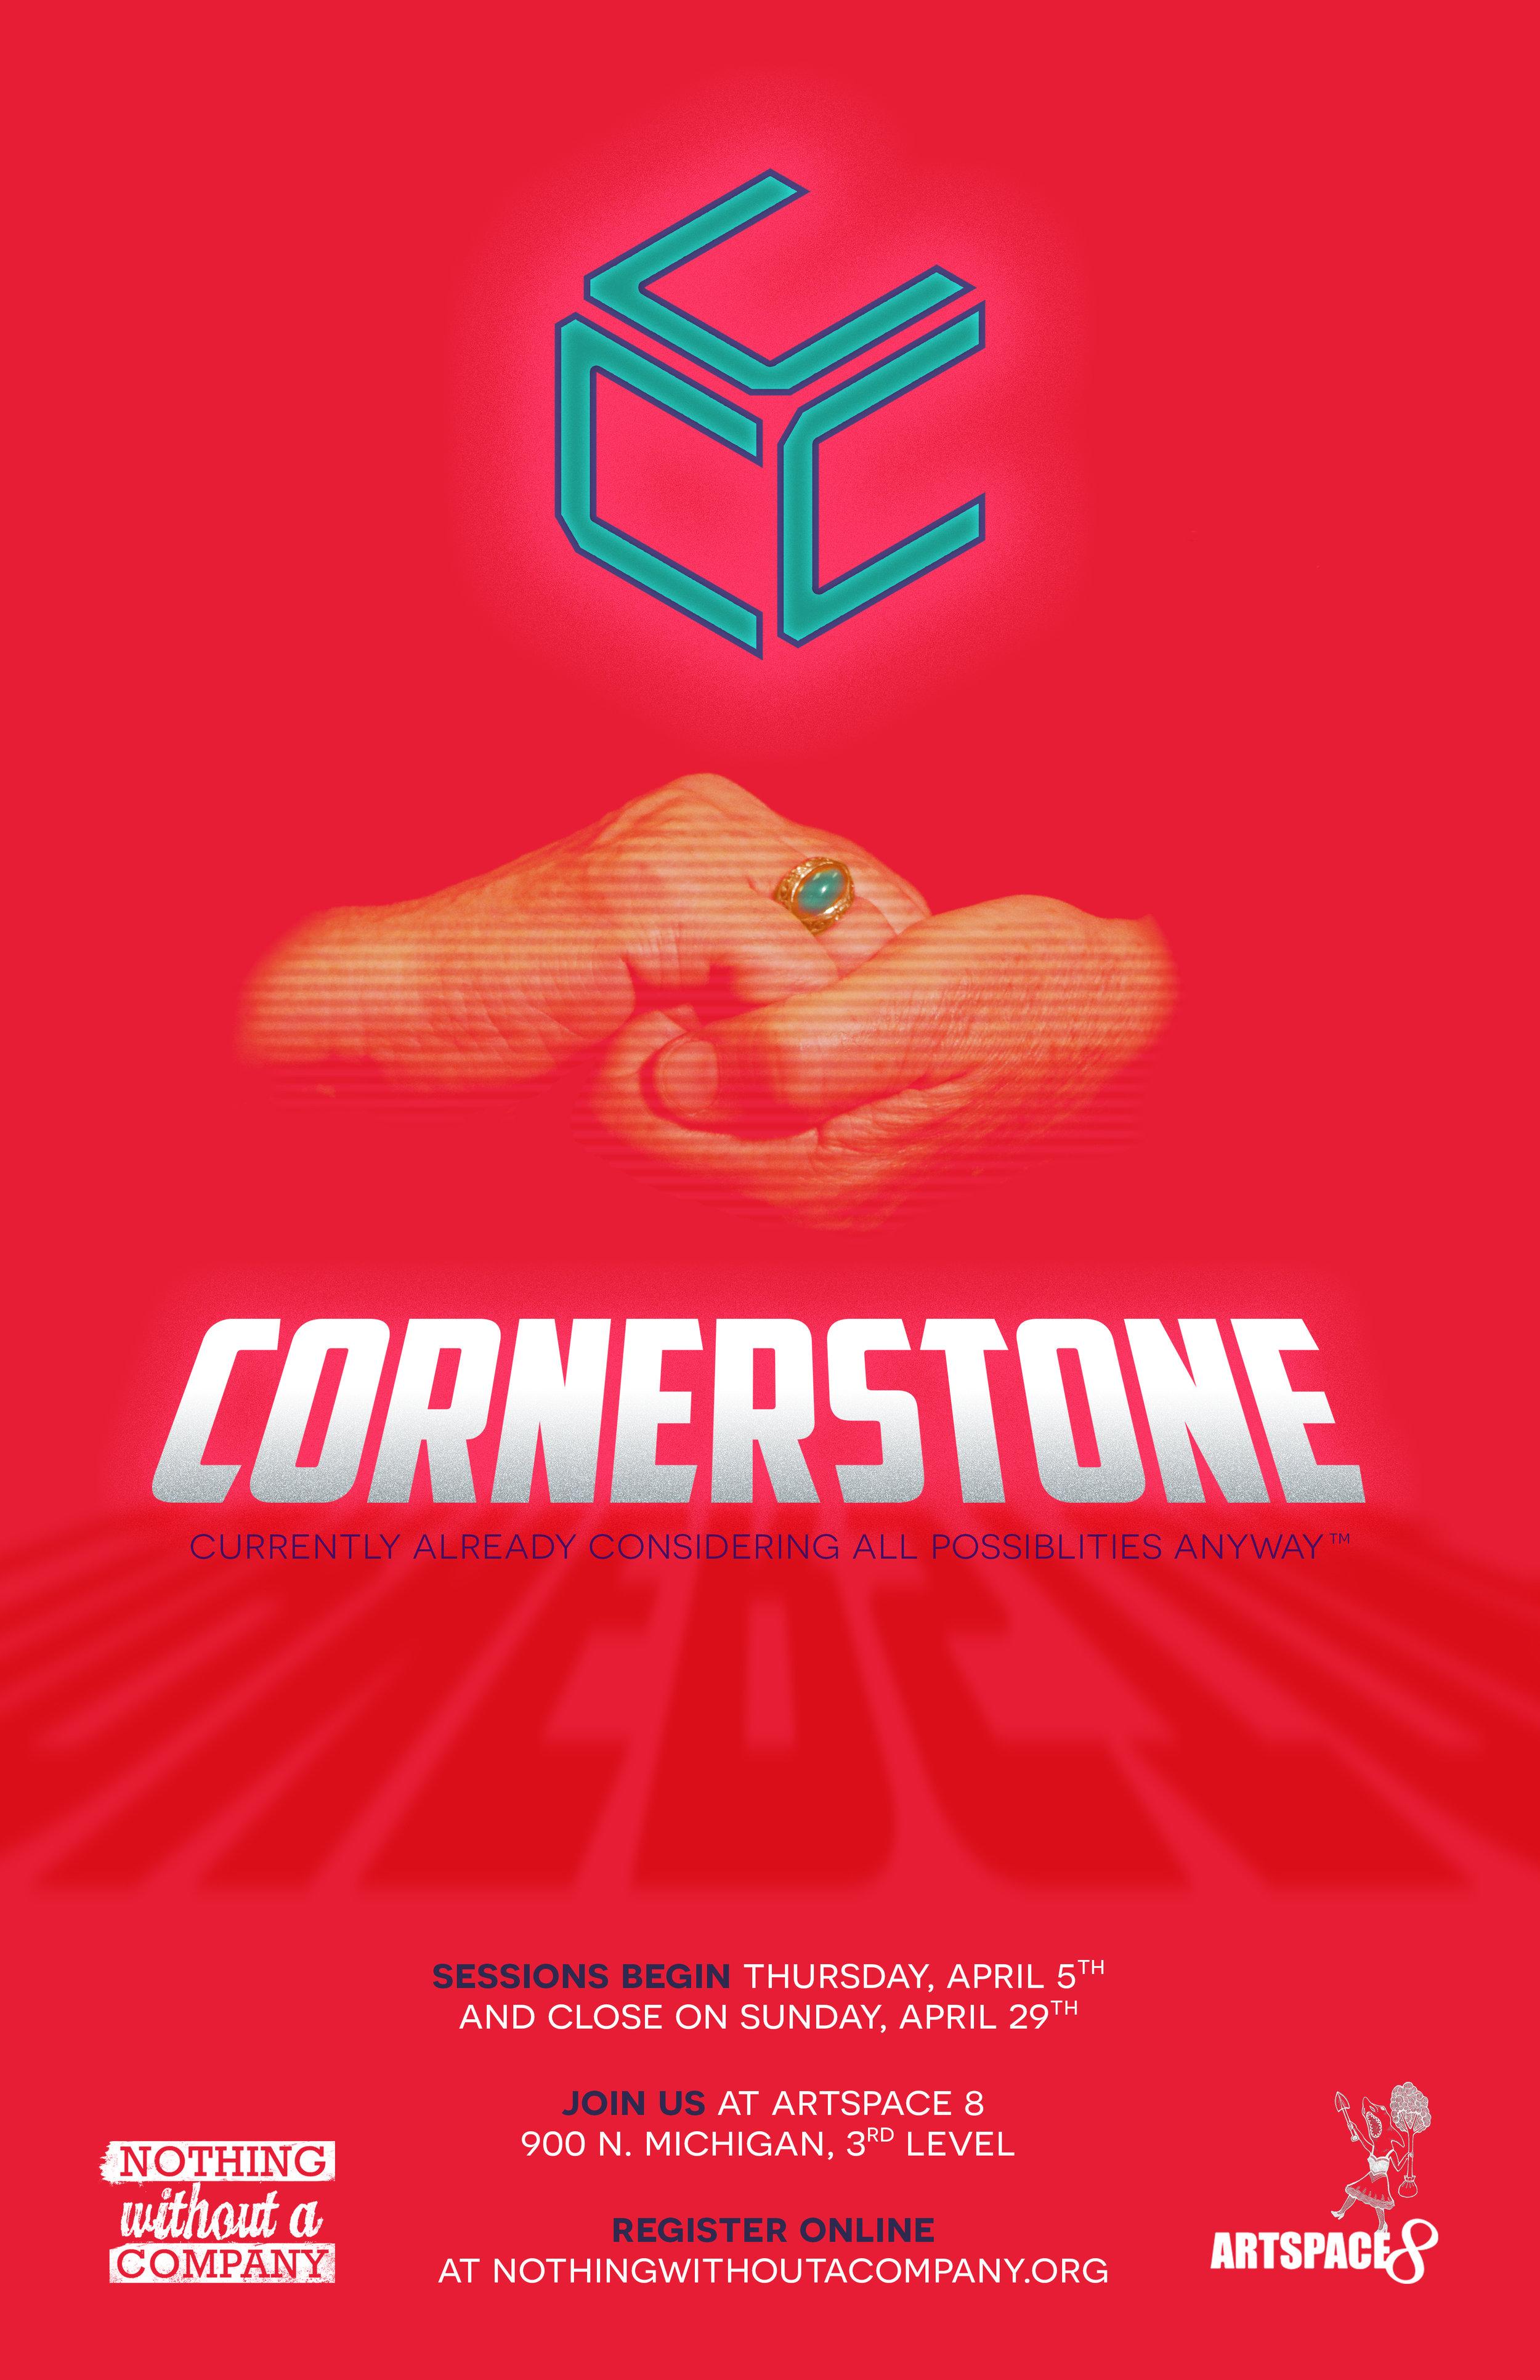 Cornerstone-FinalDraft1.jpg